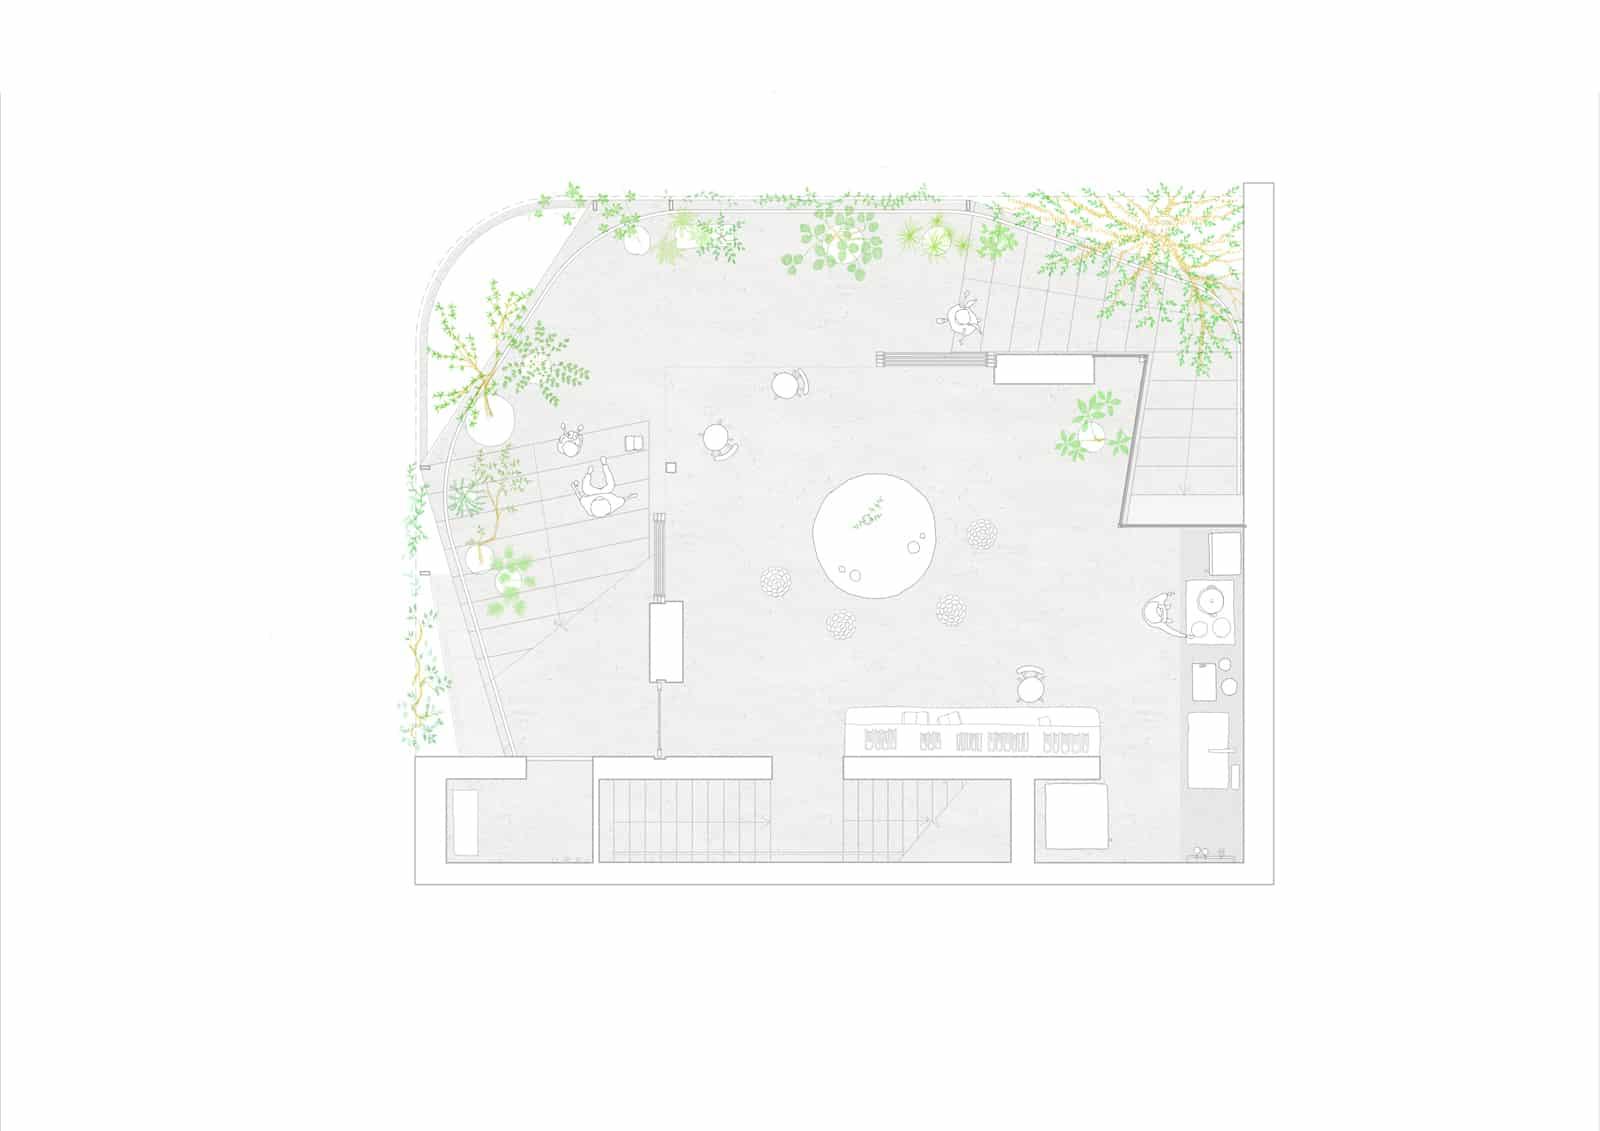 Weather House  - 20210827 NotArchitecsStudio WeatherHouse 11.2 58